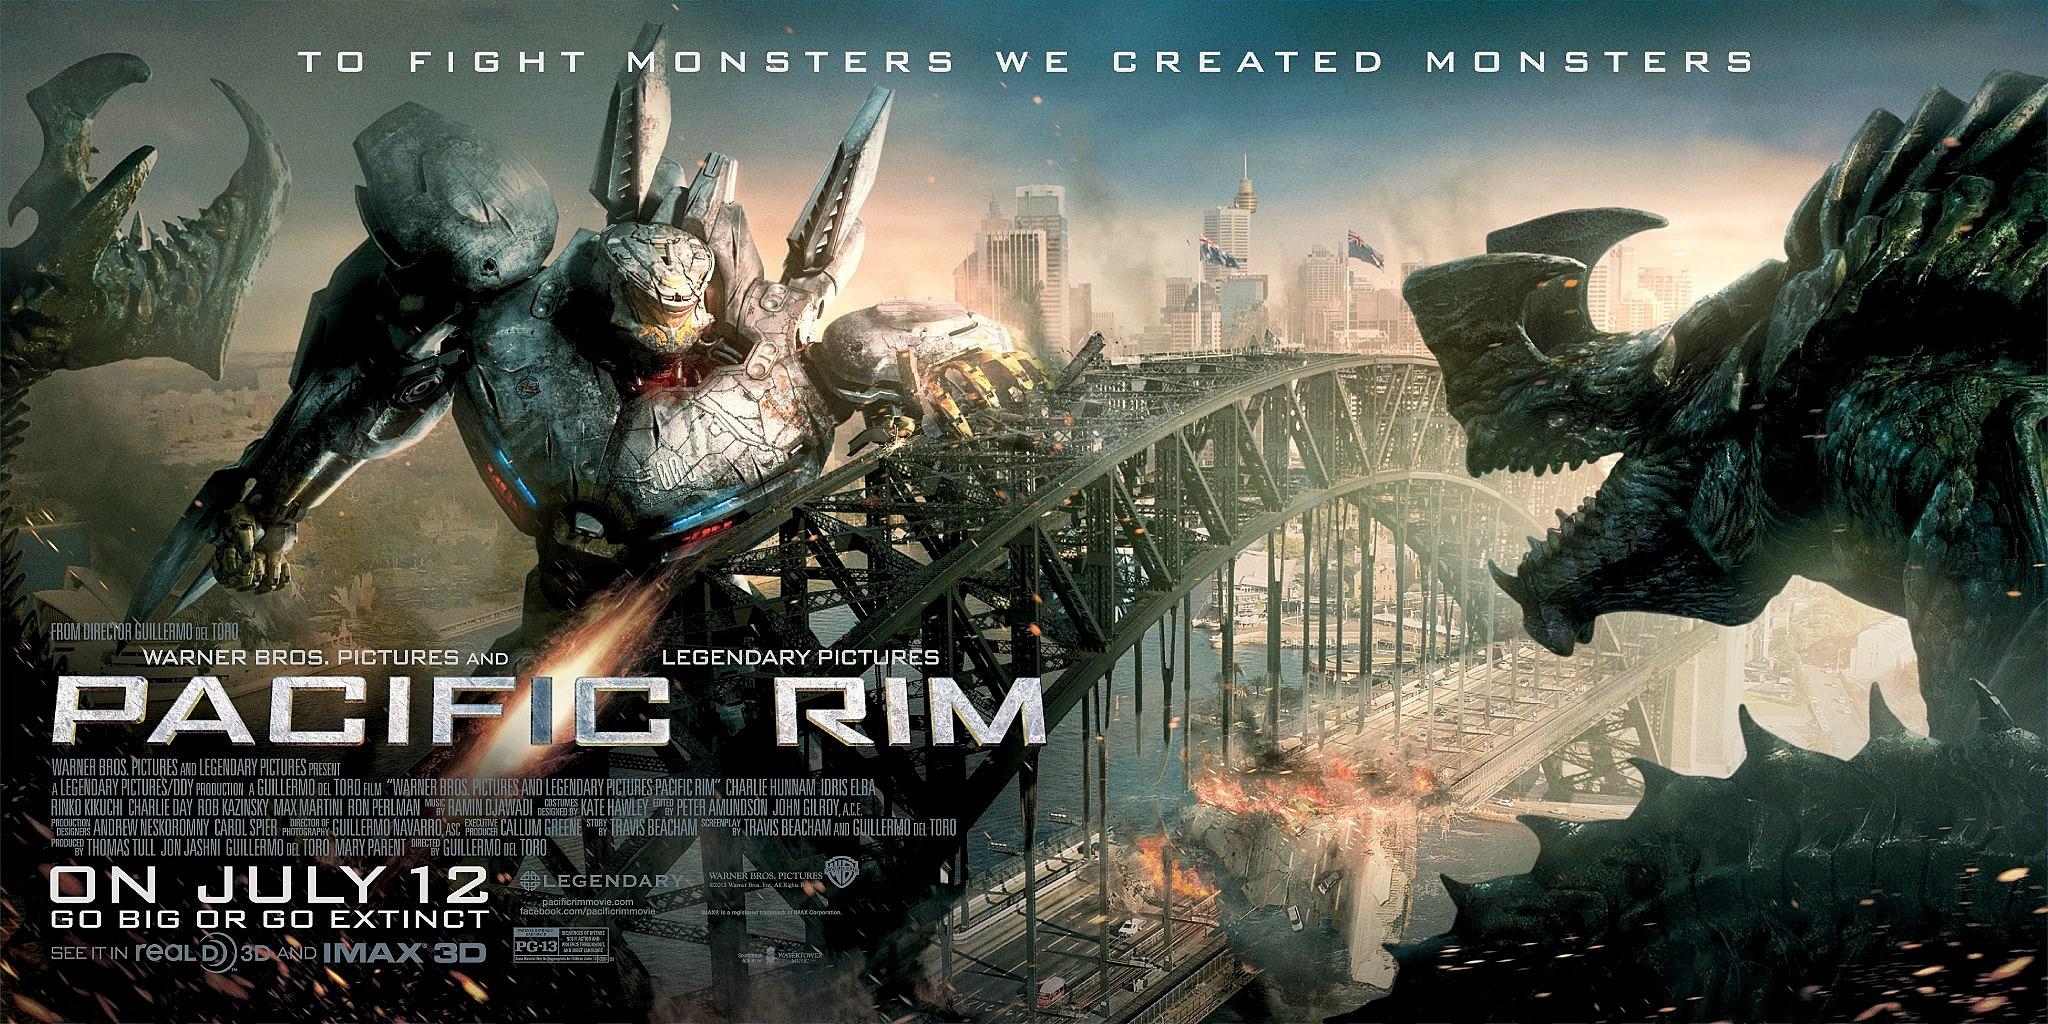 Pacific Rim Kaiju Poster 'Pacific Rim' Post...